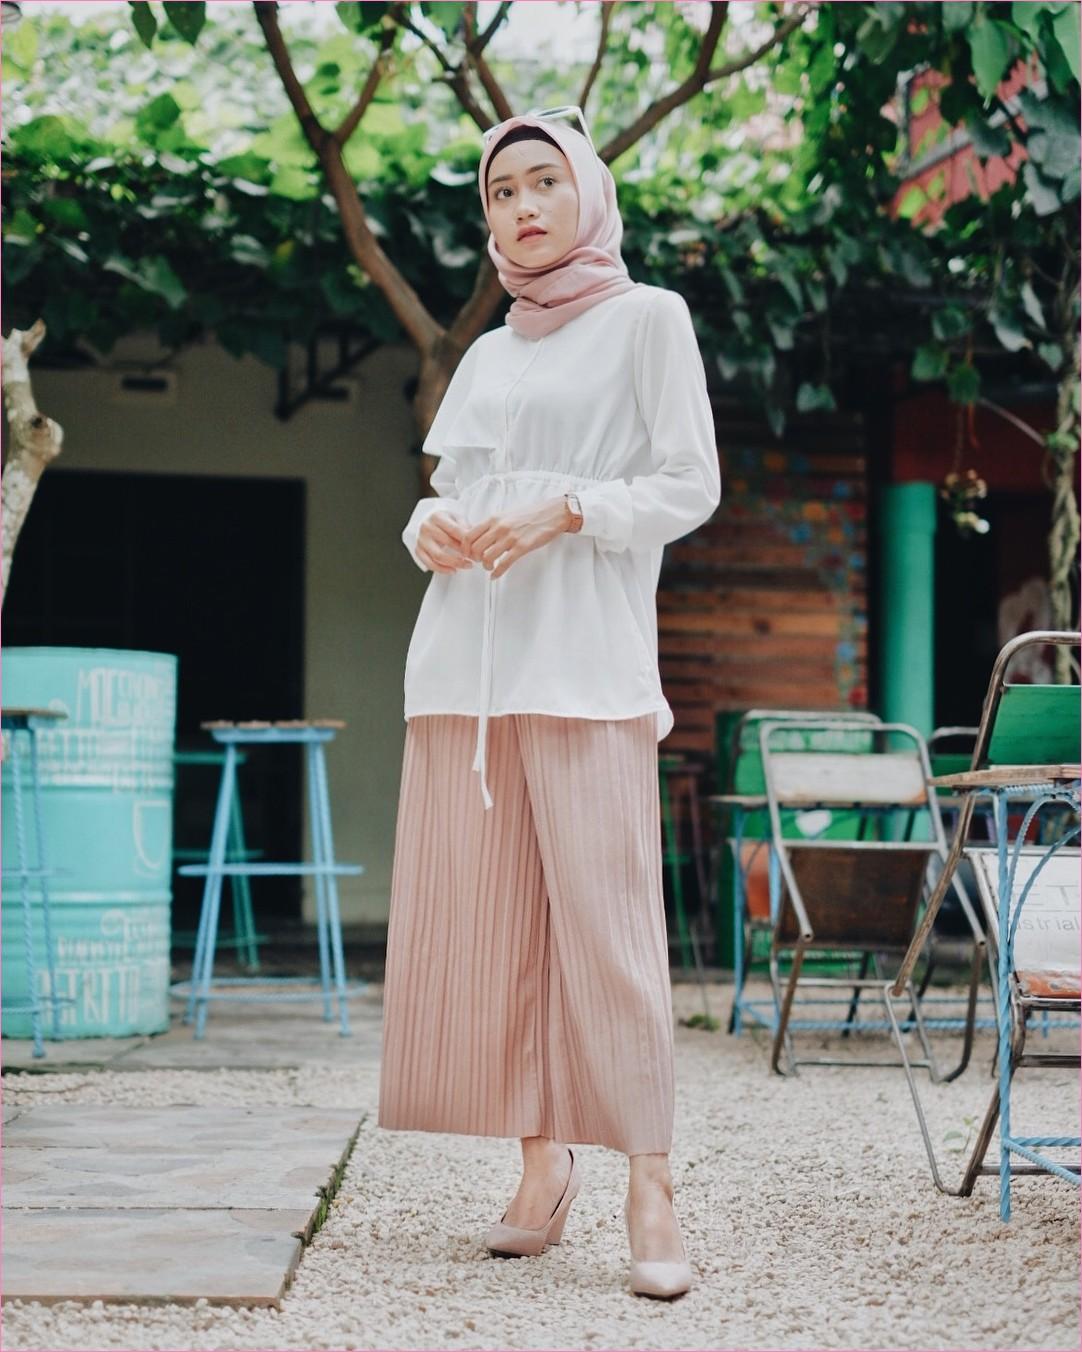 Outfit Baju Top  Blouse Untuk Hijabers Ala Selebgram 2018 blouse ikat putih celana cullotes krem pallazo segiempat hijab square ciput rajut kacamata jam tangan wedges high heels ootd trendy kursi besi